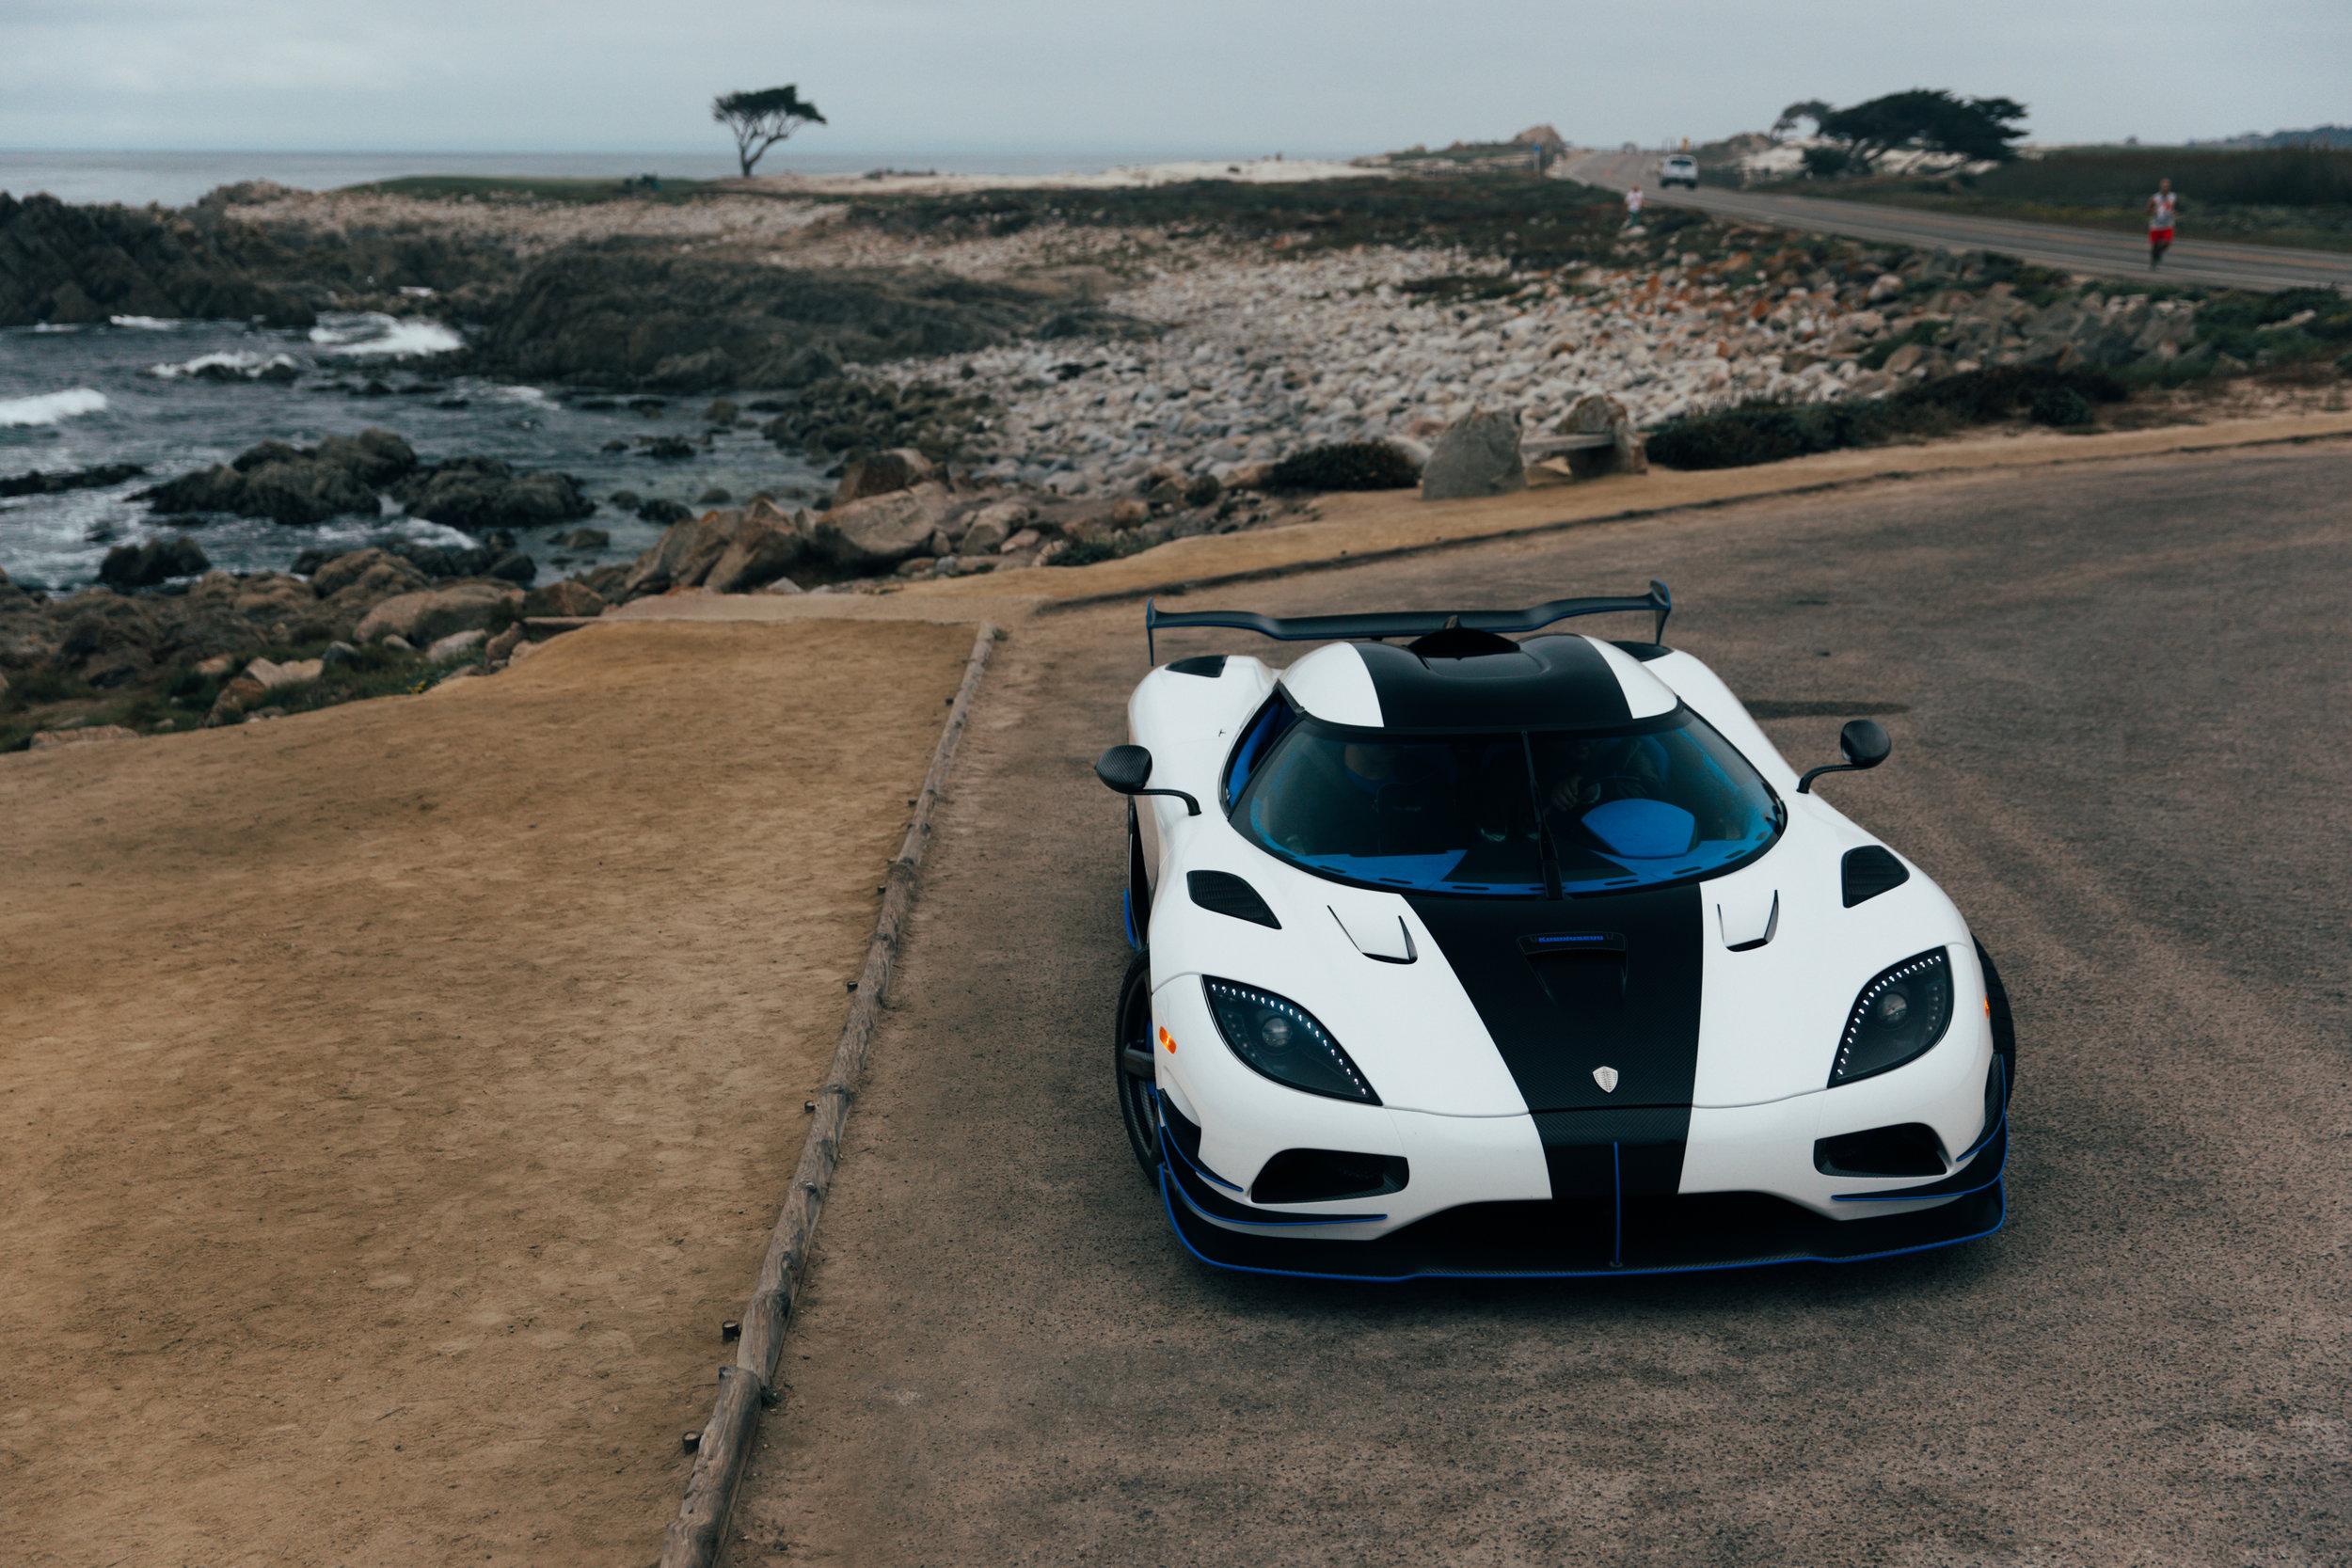 Stay_Driven_Monterey_Car_Week_Whitesse_Koenigsegg-42.jpg